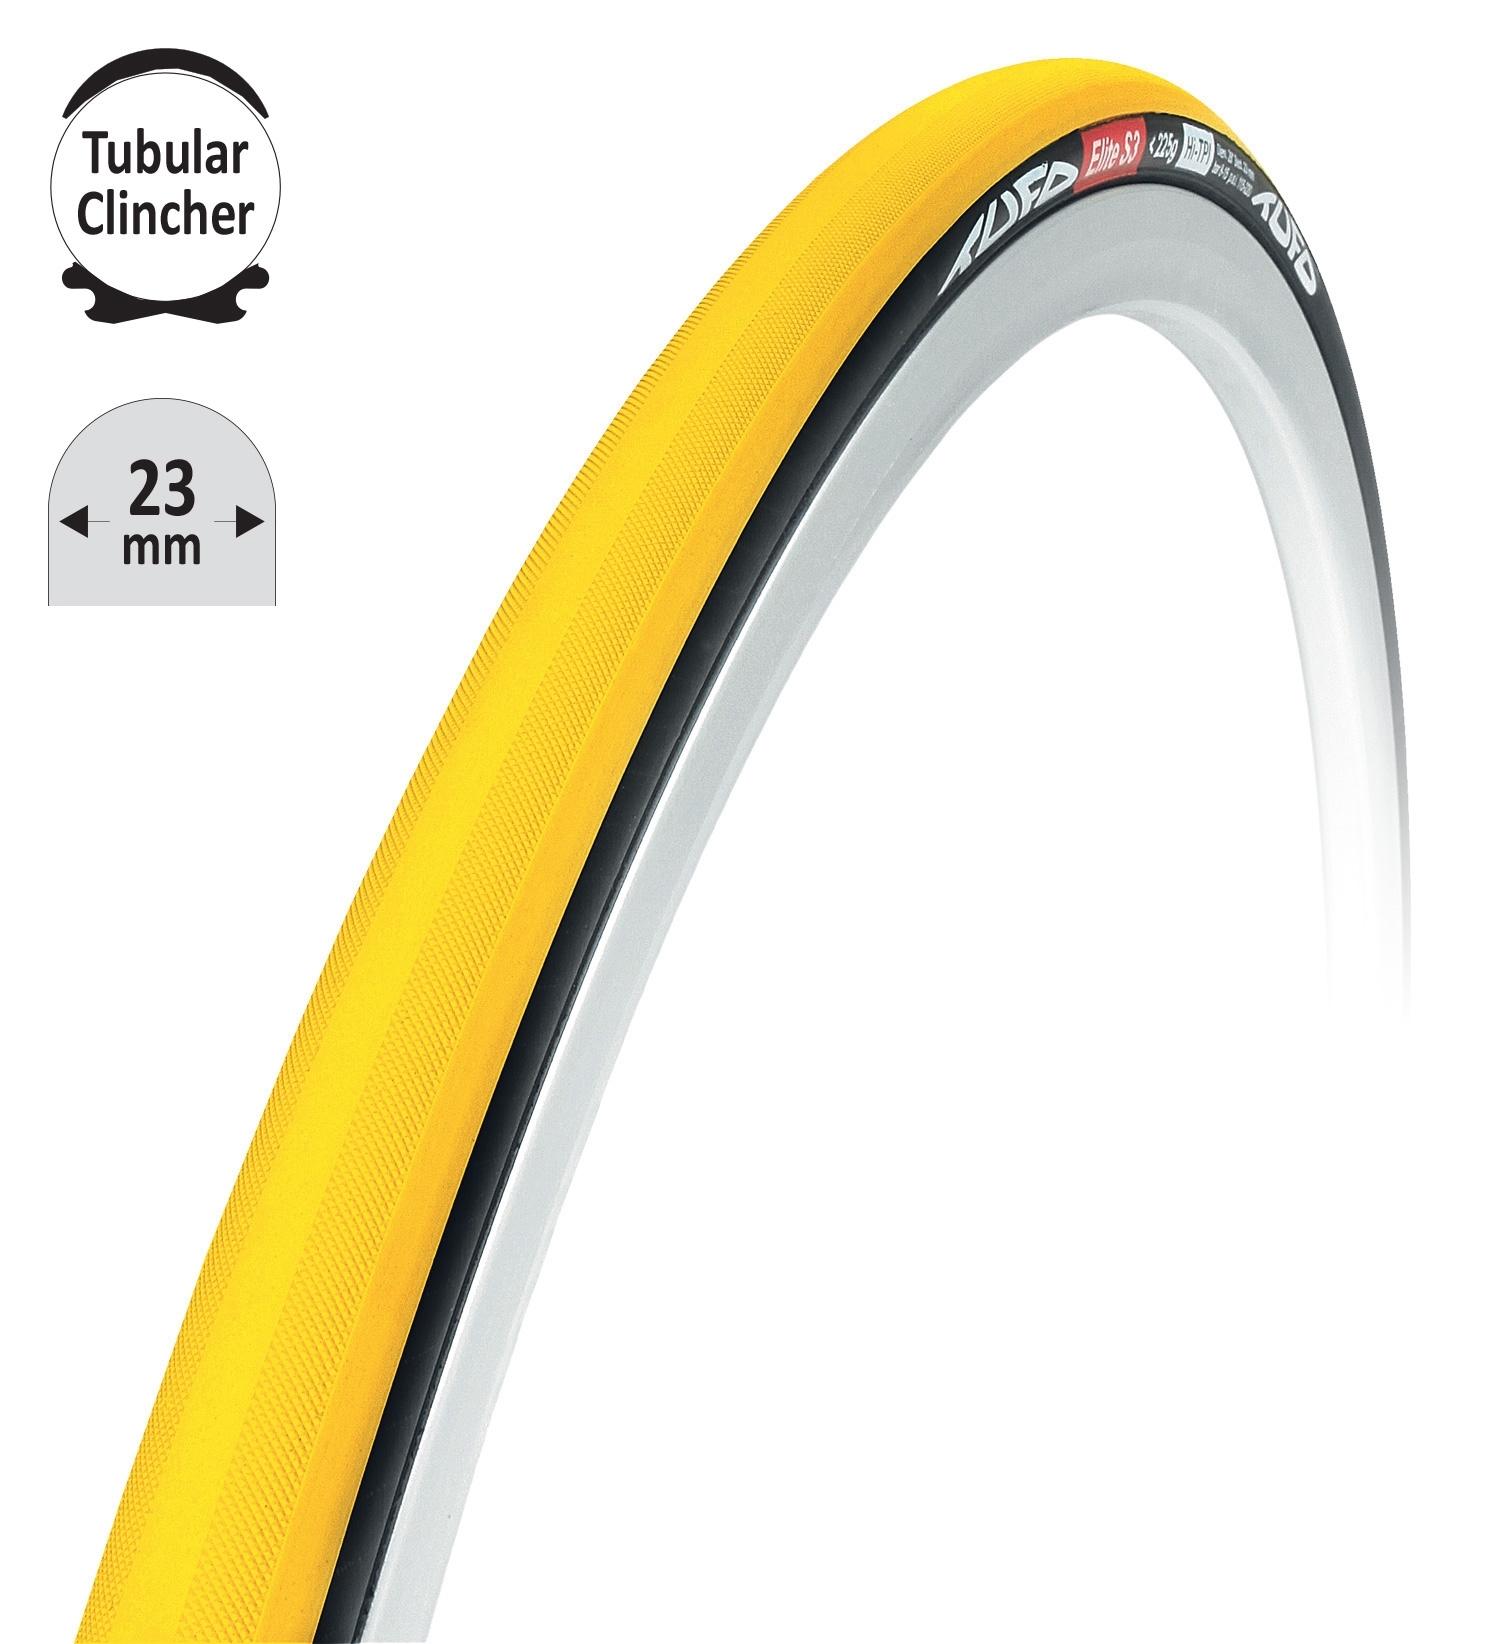 "TUFO galuska-clincher T.C ELITE S3 žluto-černá 28""/23mm"